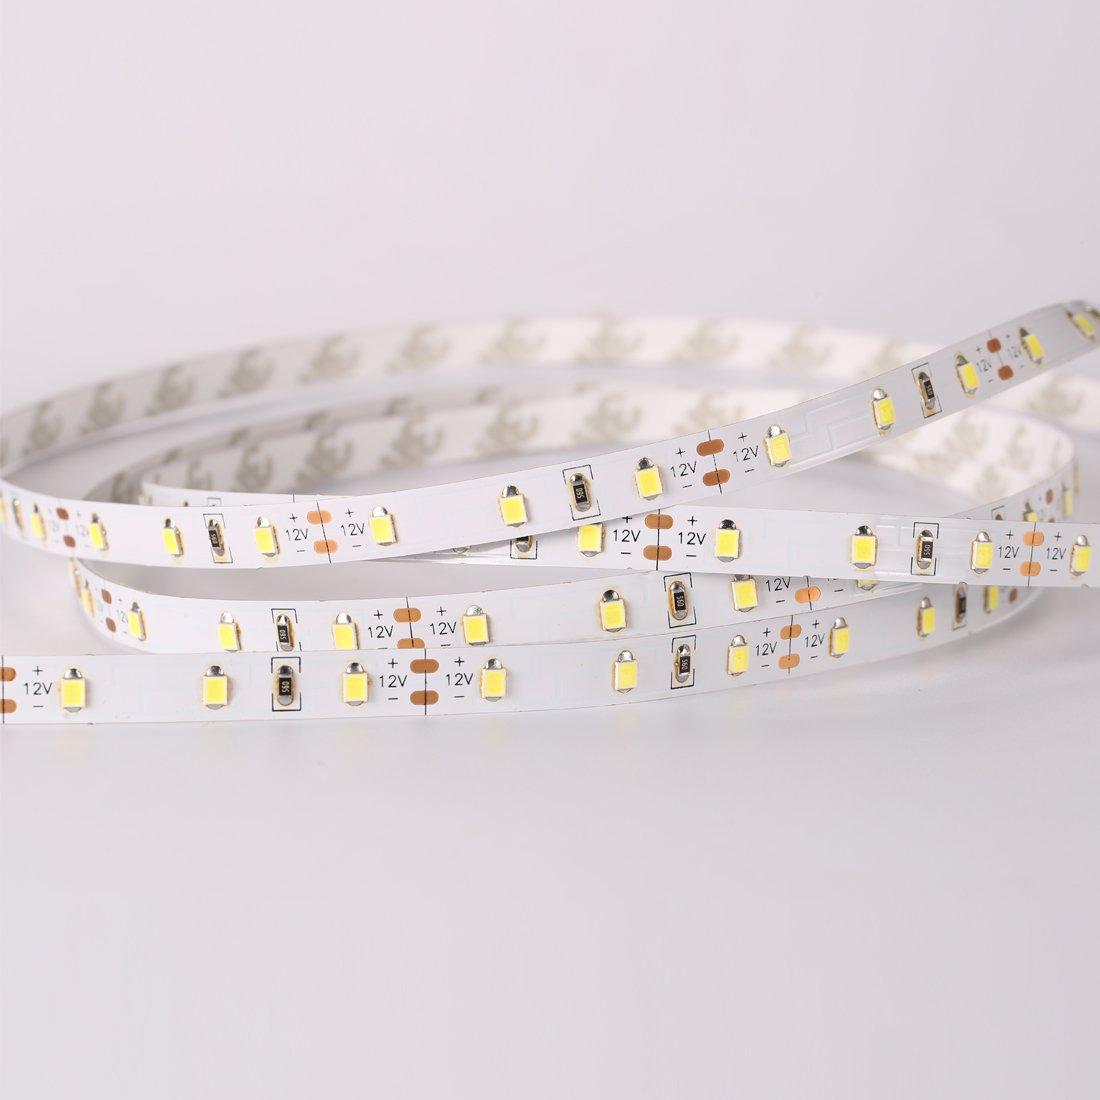 LEDMO Waterproof SMD2835 15lm CRI80 600 LED Strip Light, White (6000K) by LEDMO (Image #2)